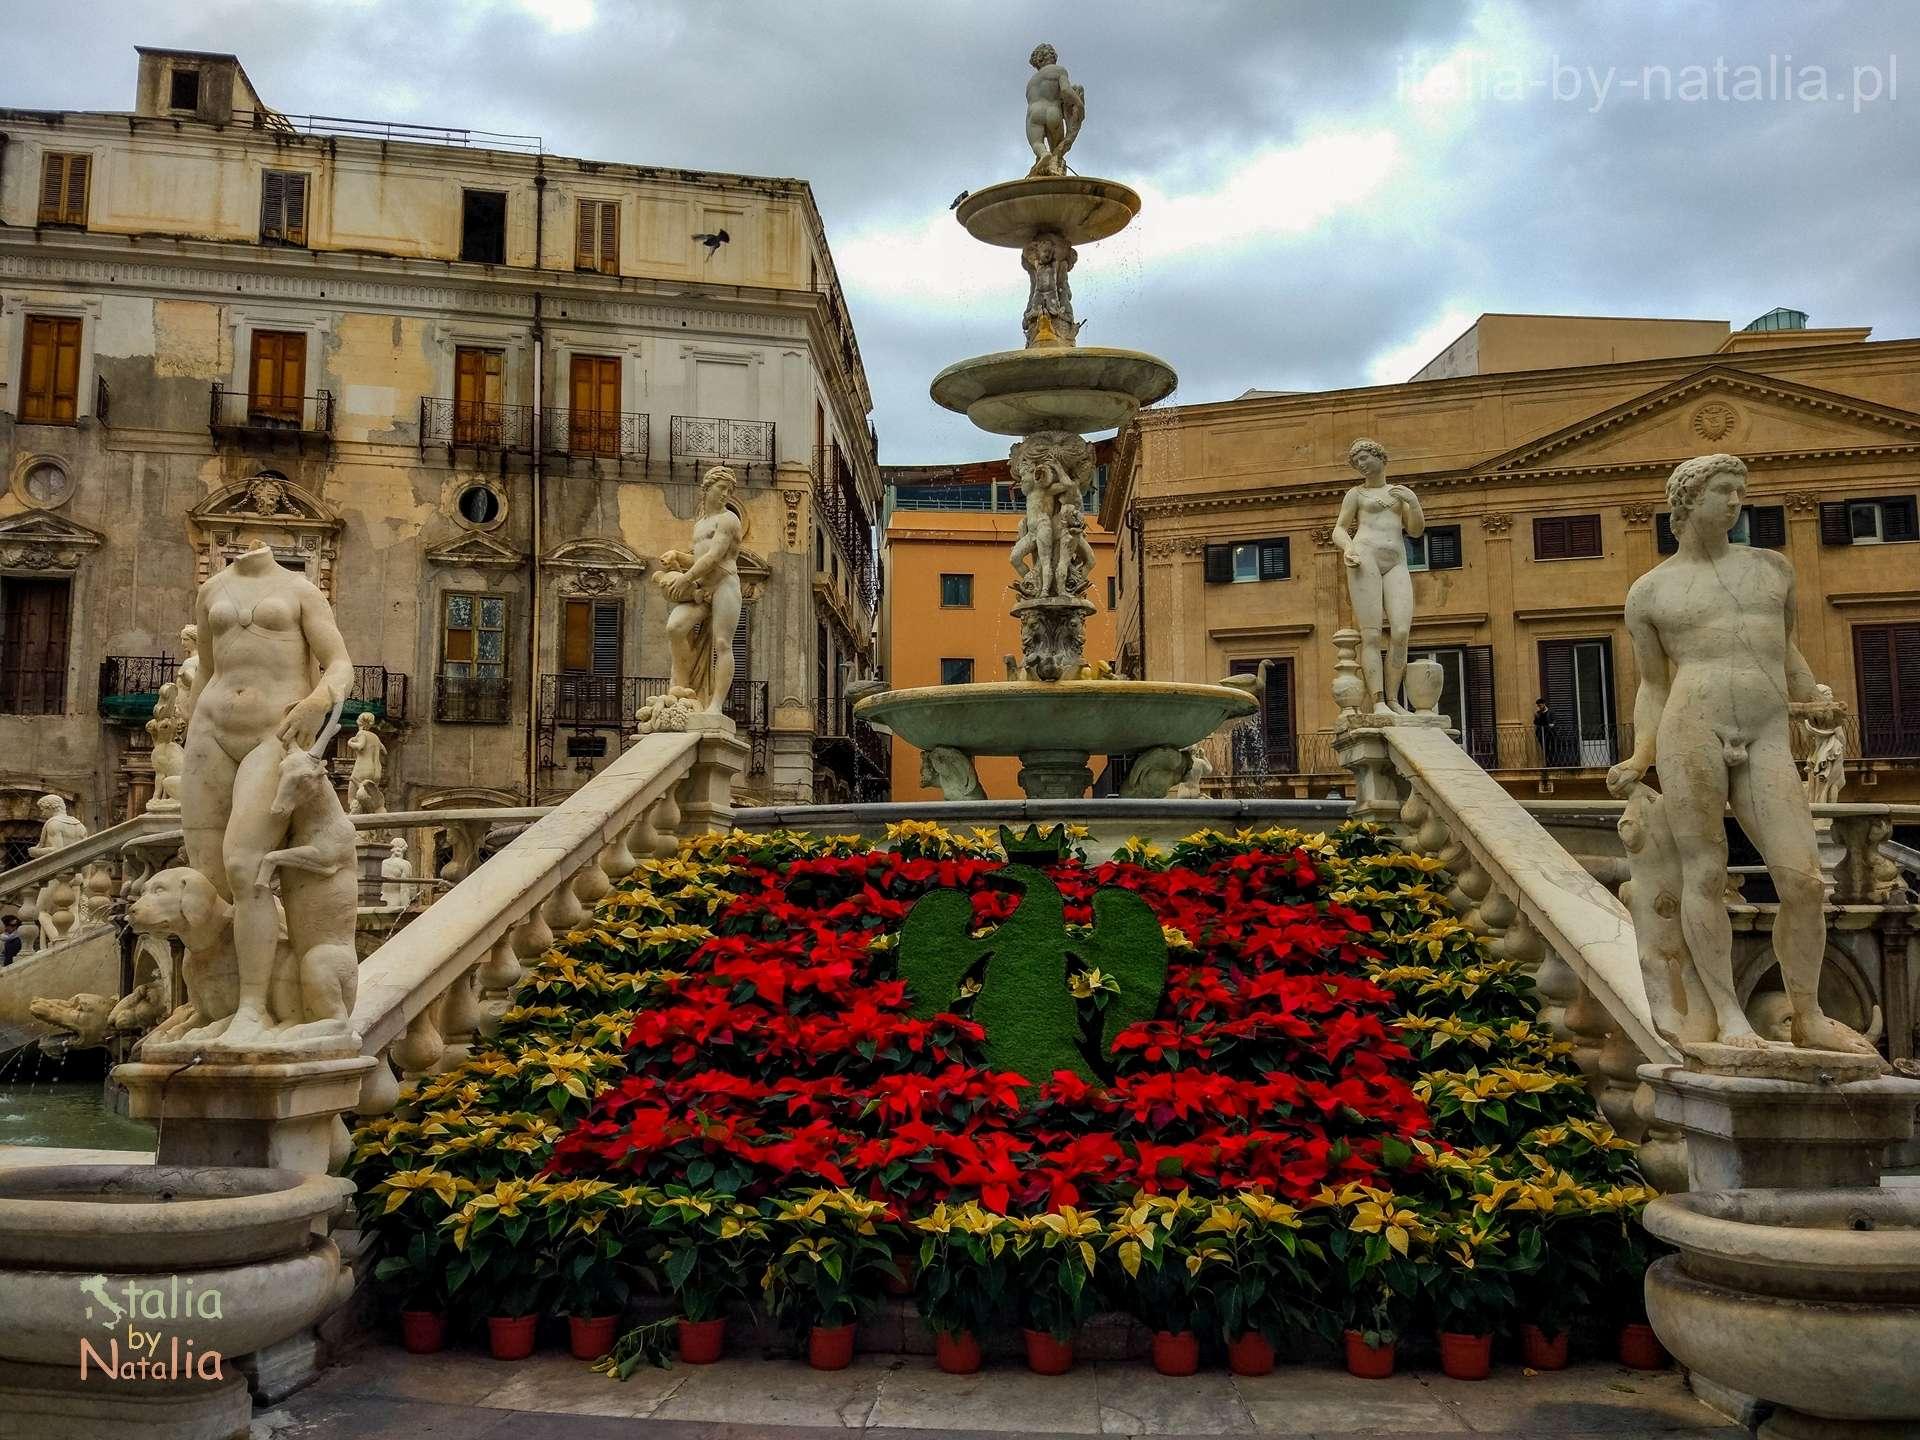 Palermo Sycylia grudzien december christmas święta Pretoria